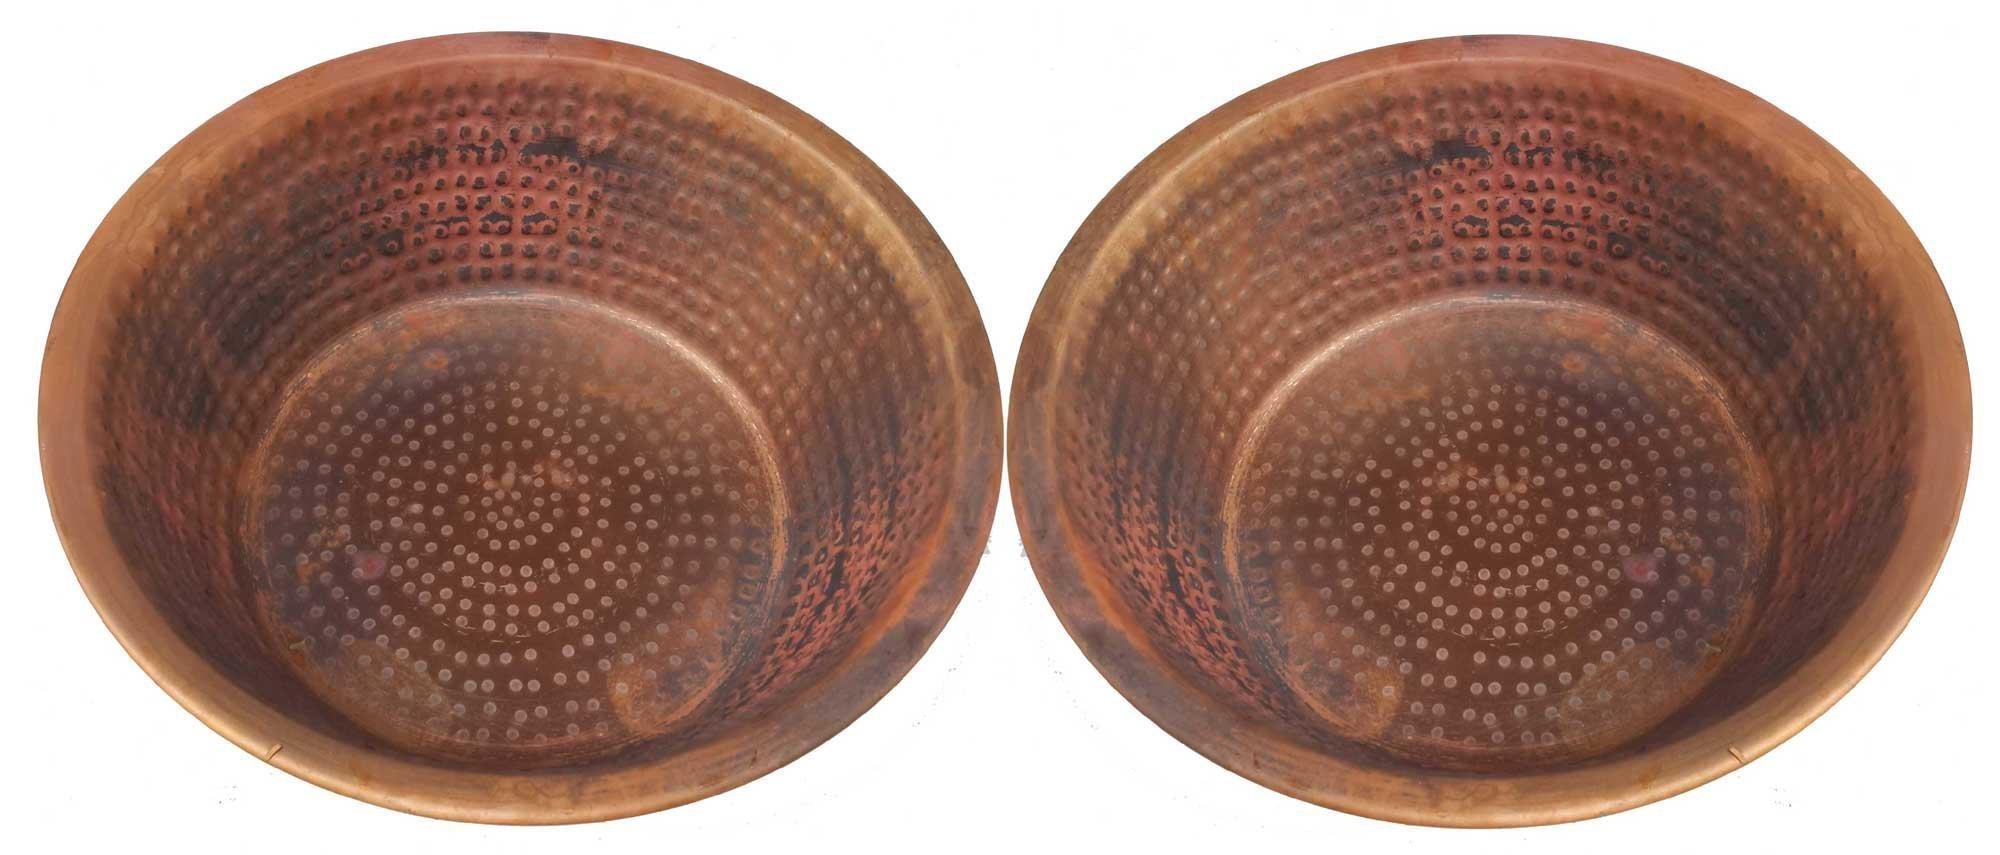 Egypt gift shops Pair Fire Burnt Copper Pedicure Spa Massage Foot Bath Soak Wash Spa Styling Salon Massage Bowls